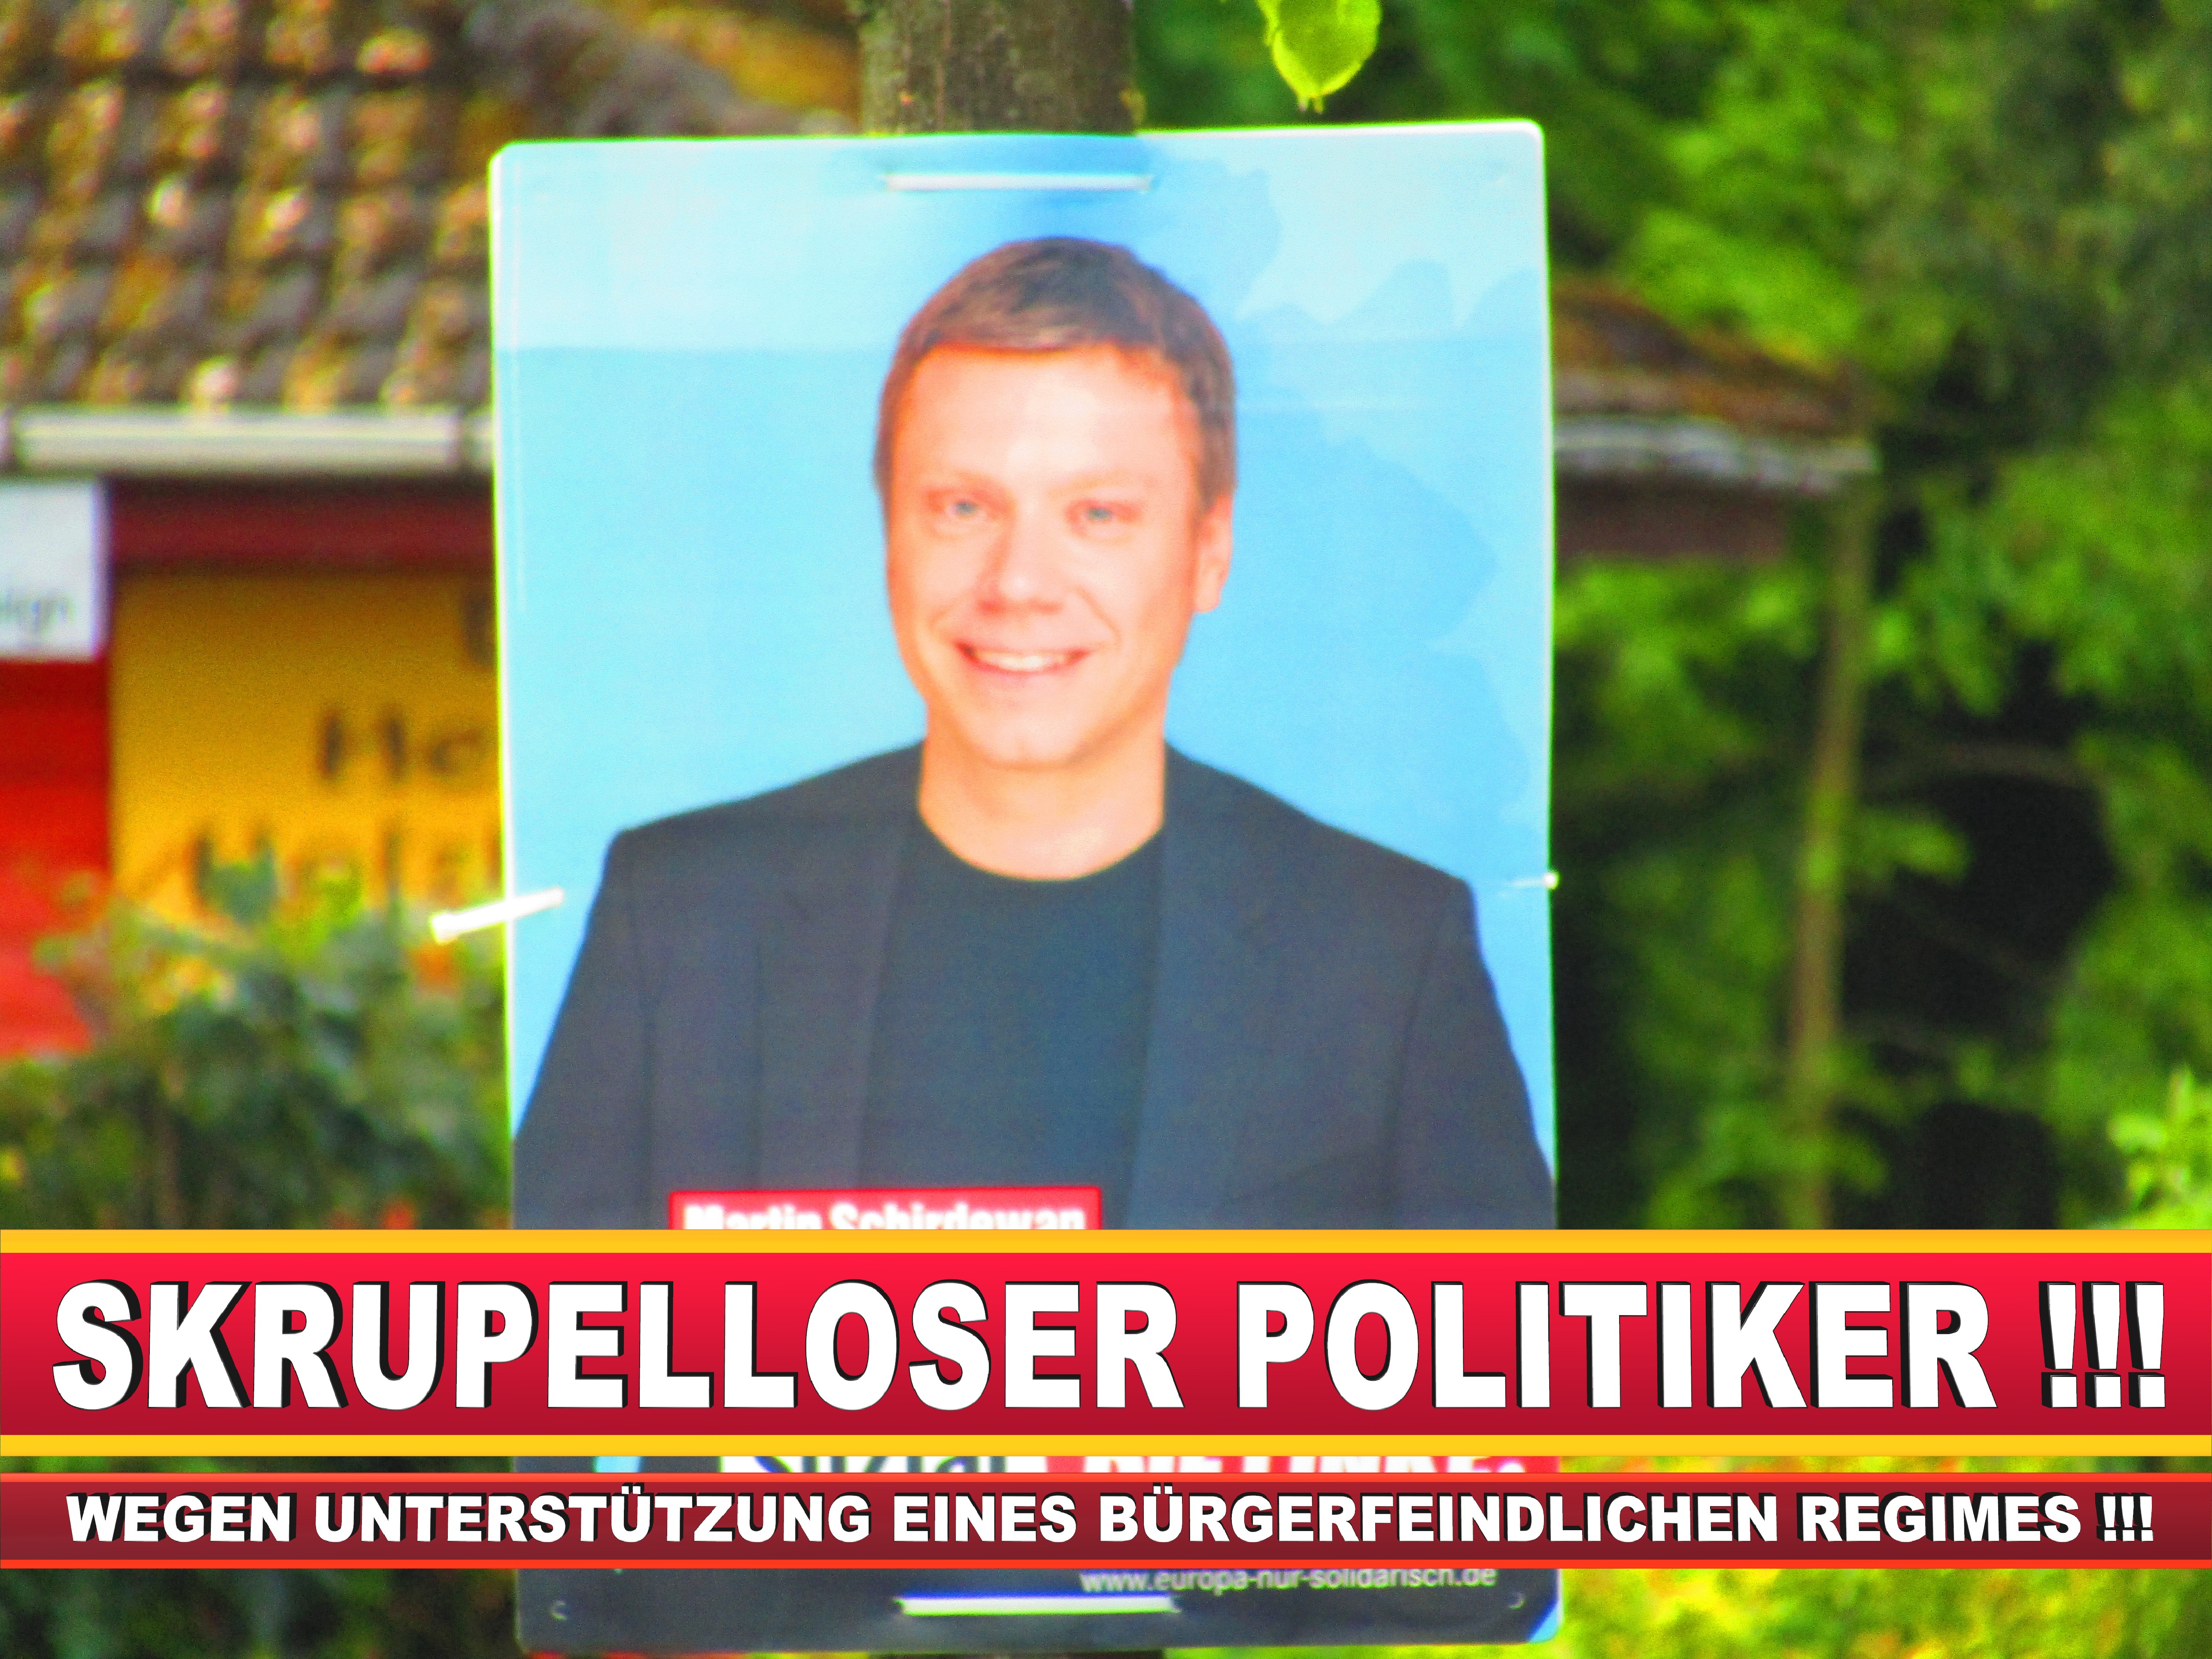 Europawahl Deutschland Wahlplakate CDU SPD FDP Grüne Linke AfD (23)